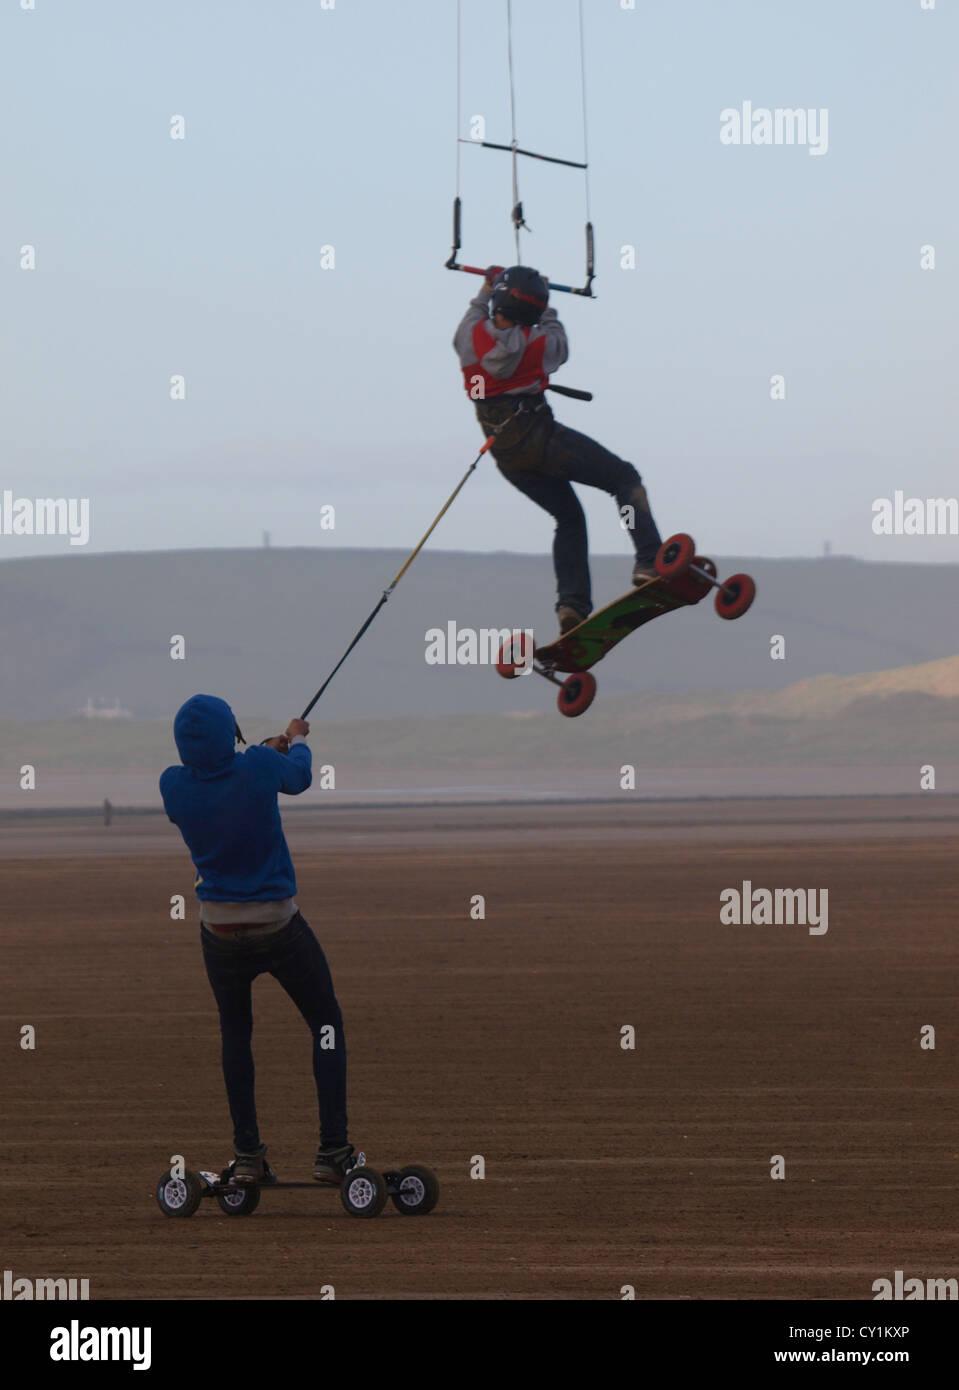 BKSA, British Kitesurfing Association, Westward Ho! 2012, Devon, UK - Stock Image